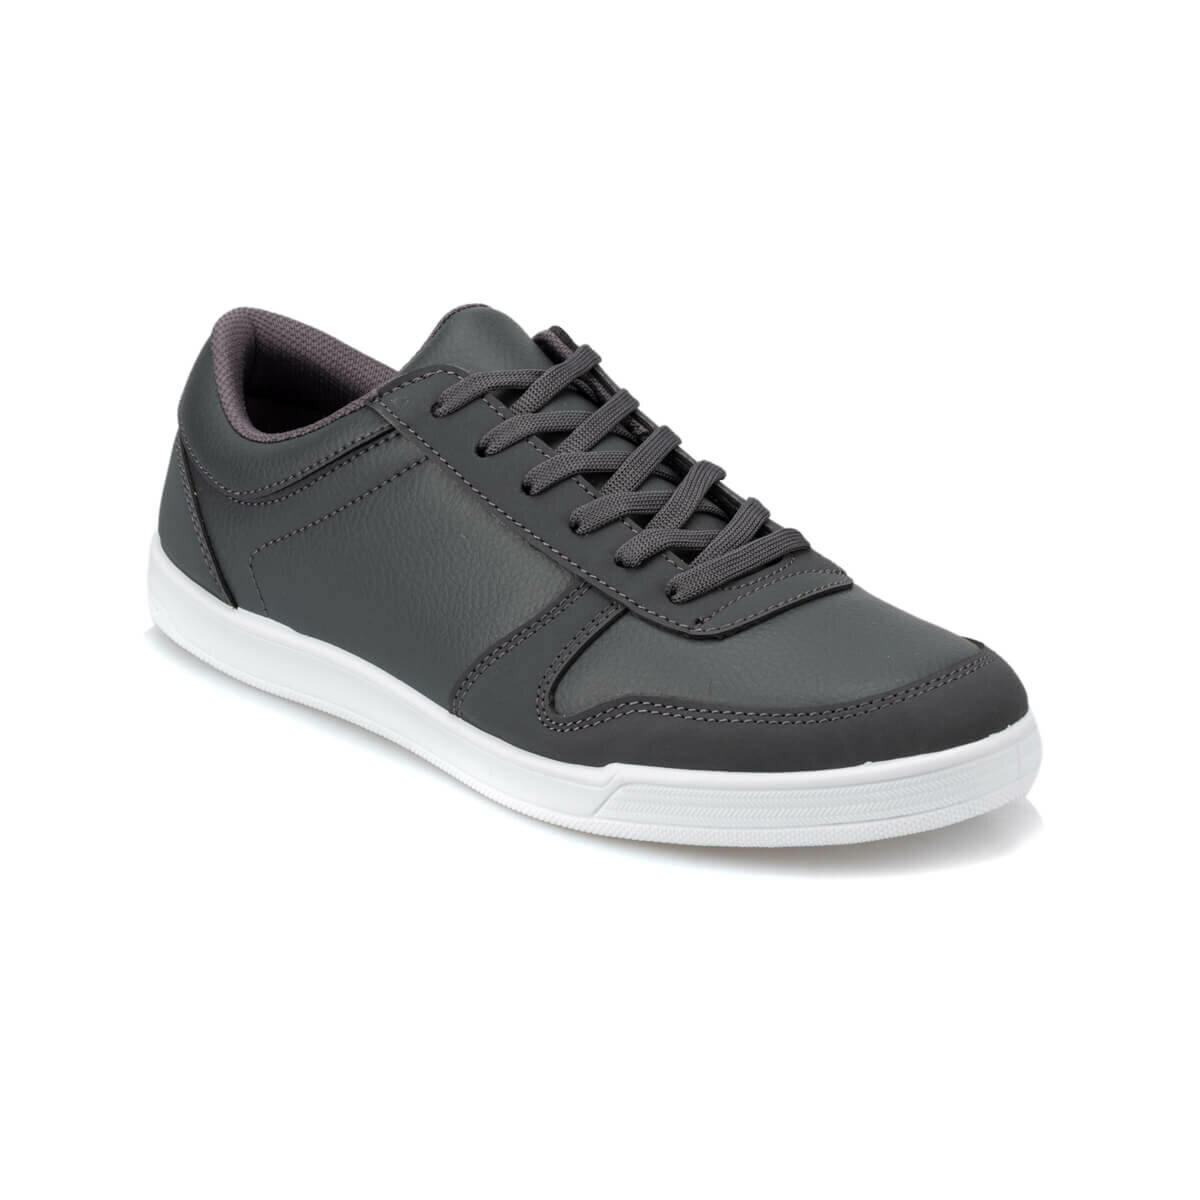 FLO 92.356074.M Gray Men Shoes Polaris